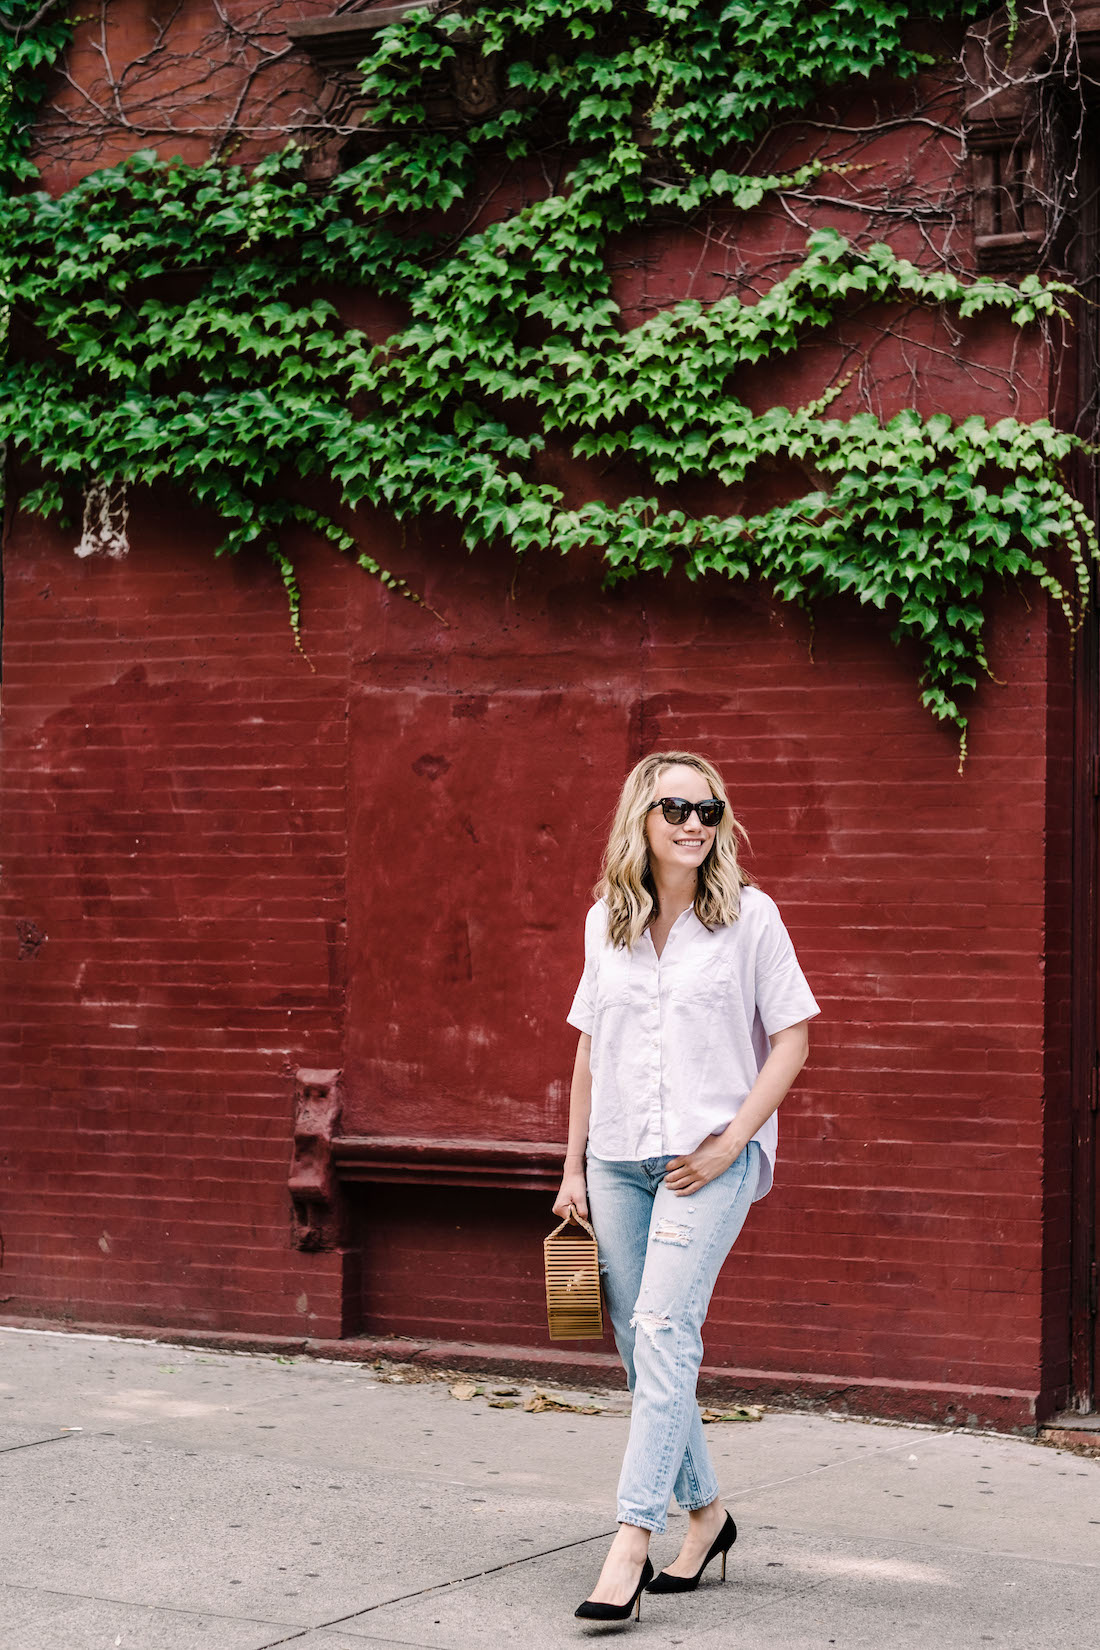 Outfit Details: Madewell Courier Shirt // Levi's Jeans // Cult Gaia Bag // Manolo Blahnik Heels // Polaroid Sunglasses - The Stripe